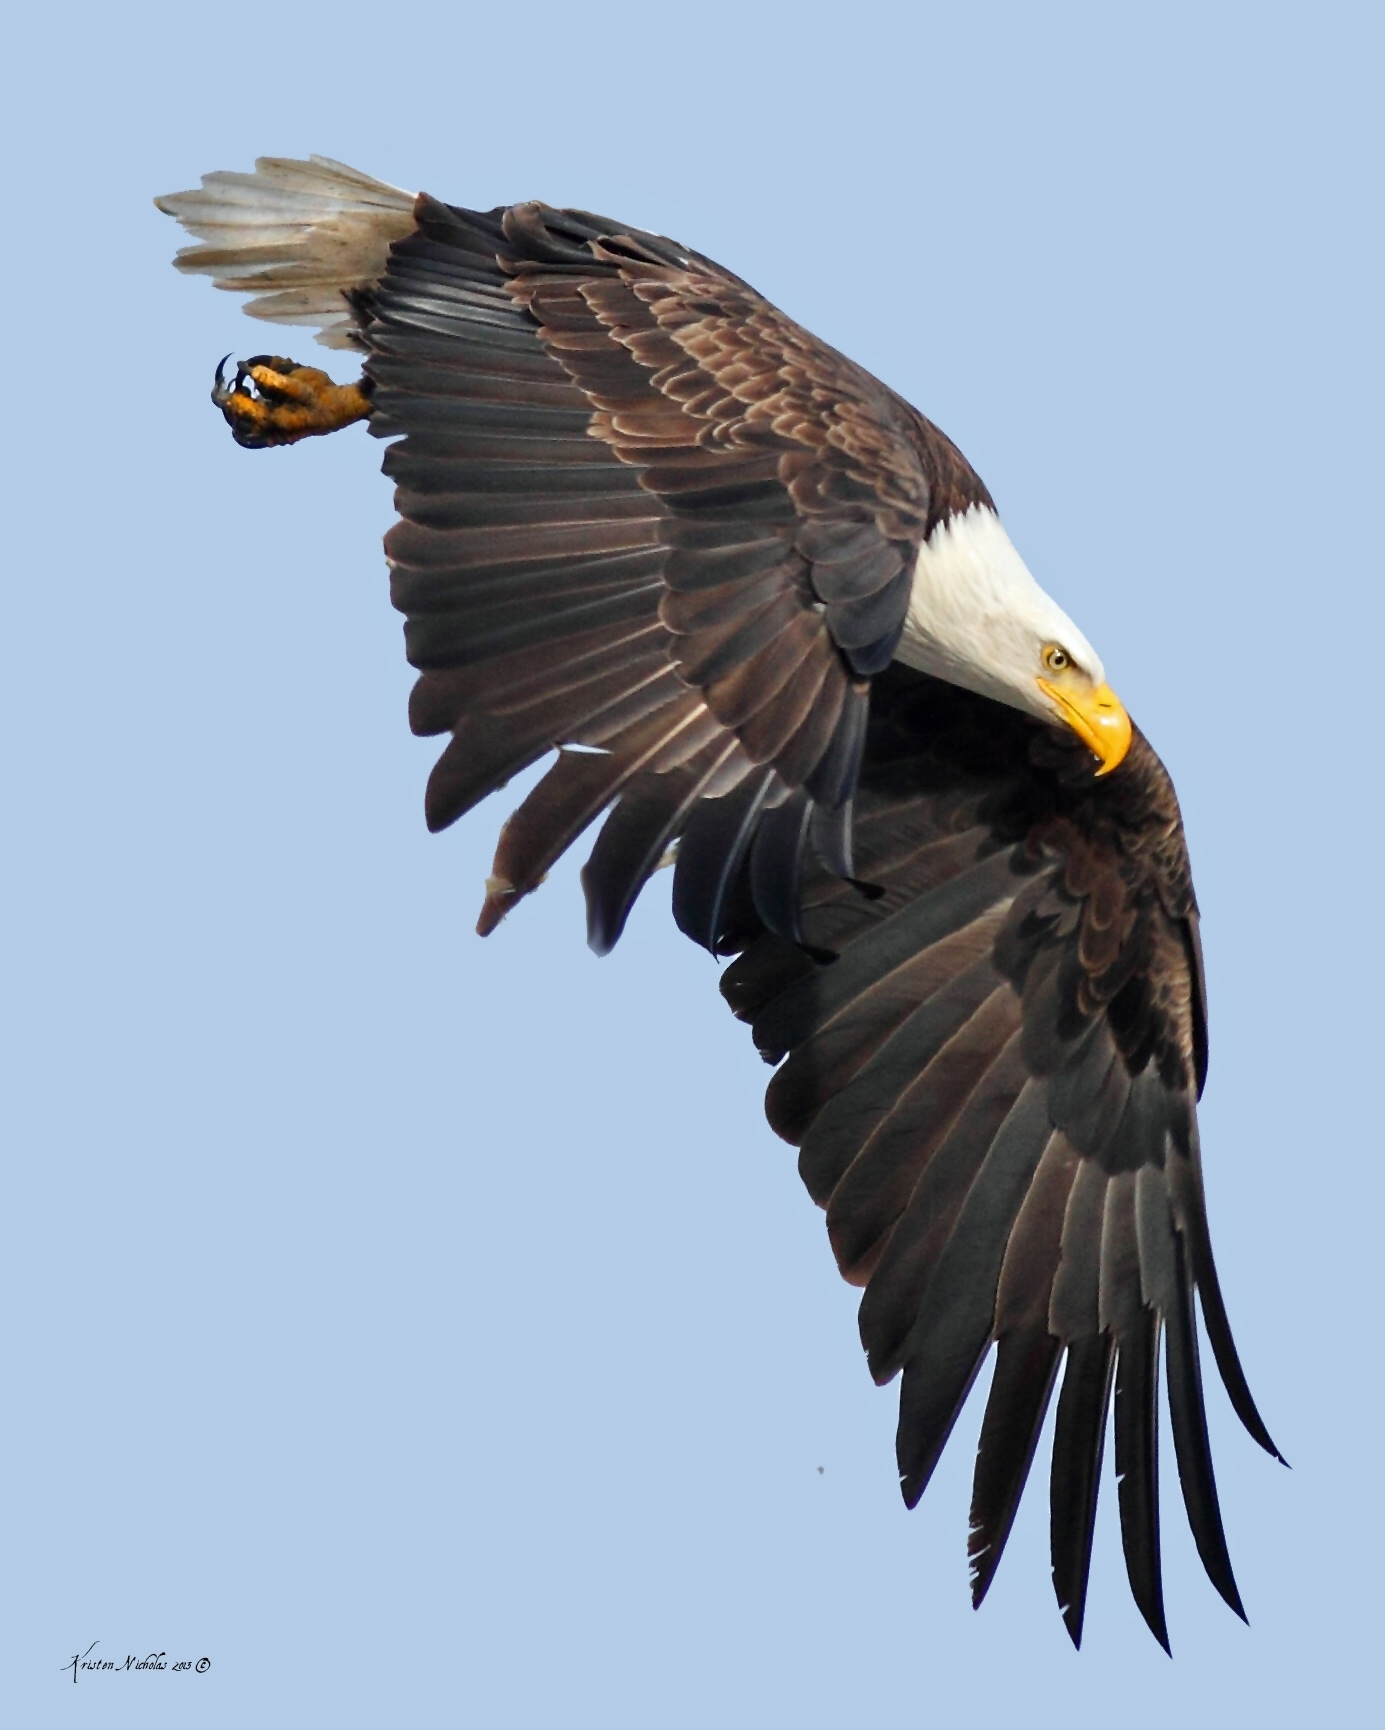 Wild Turkey Hen Decoy Killed By A Bald Eagle In New Jersey